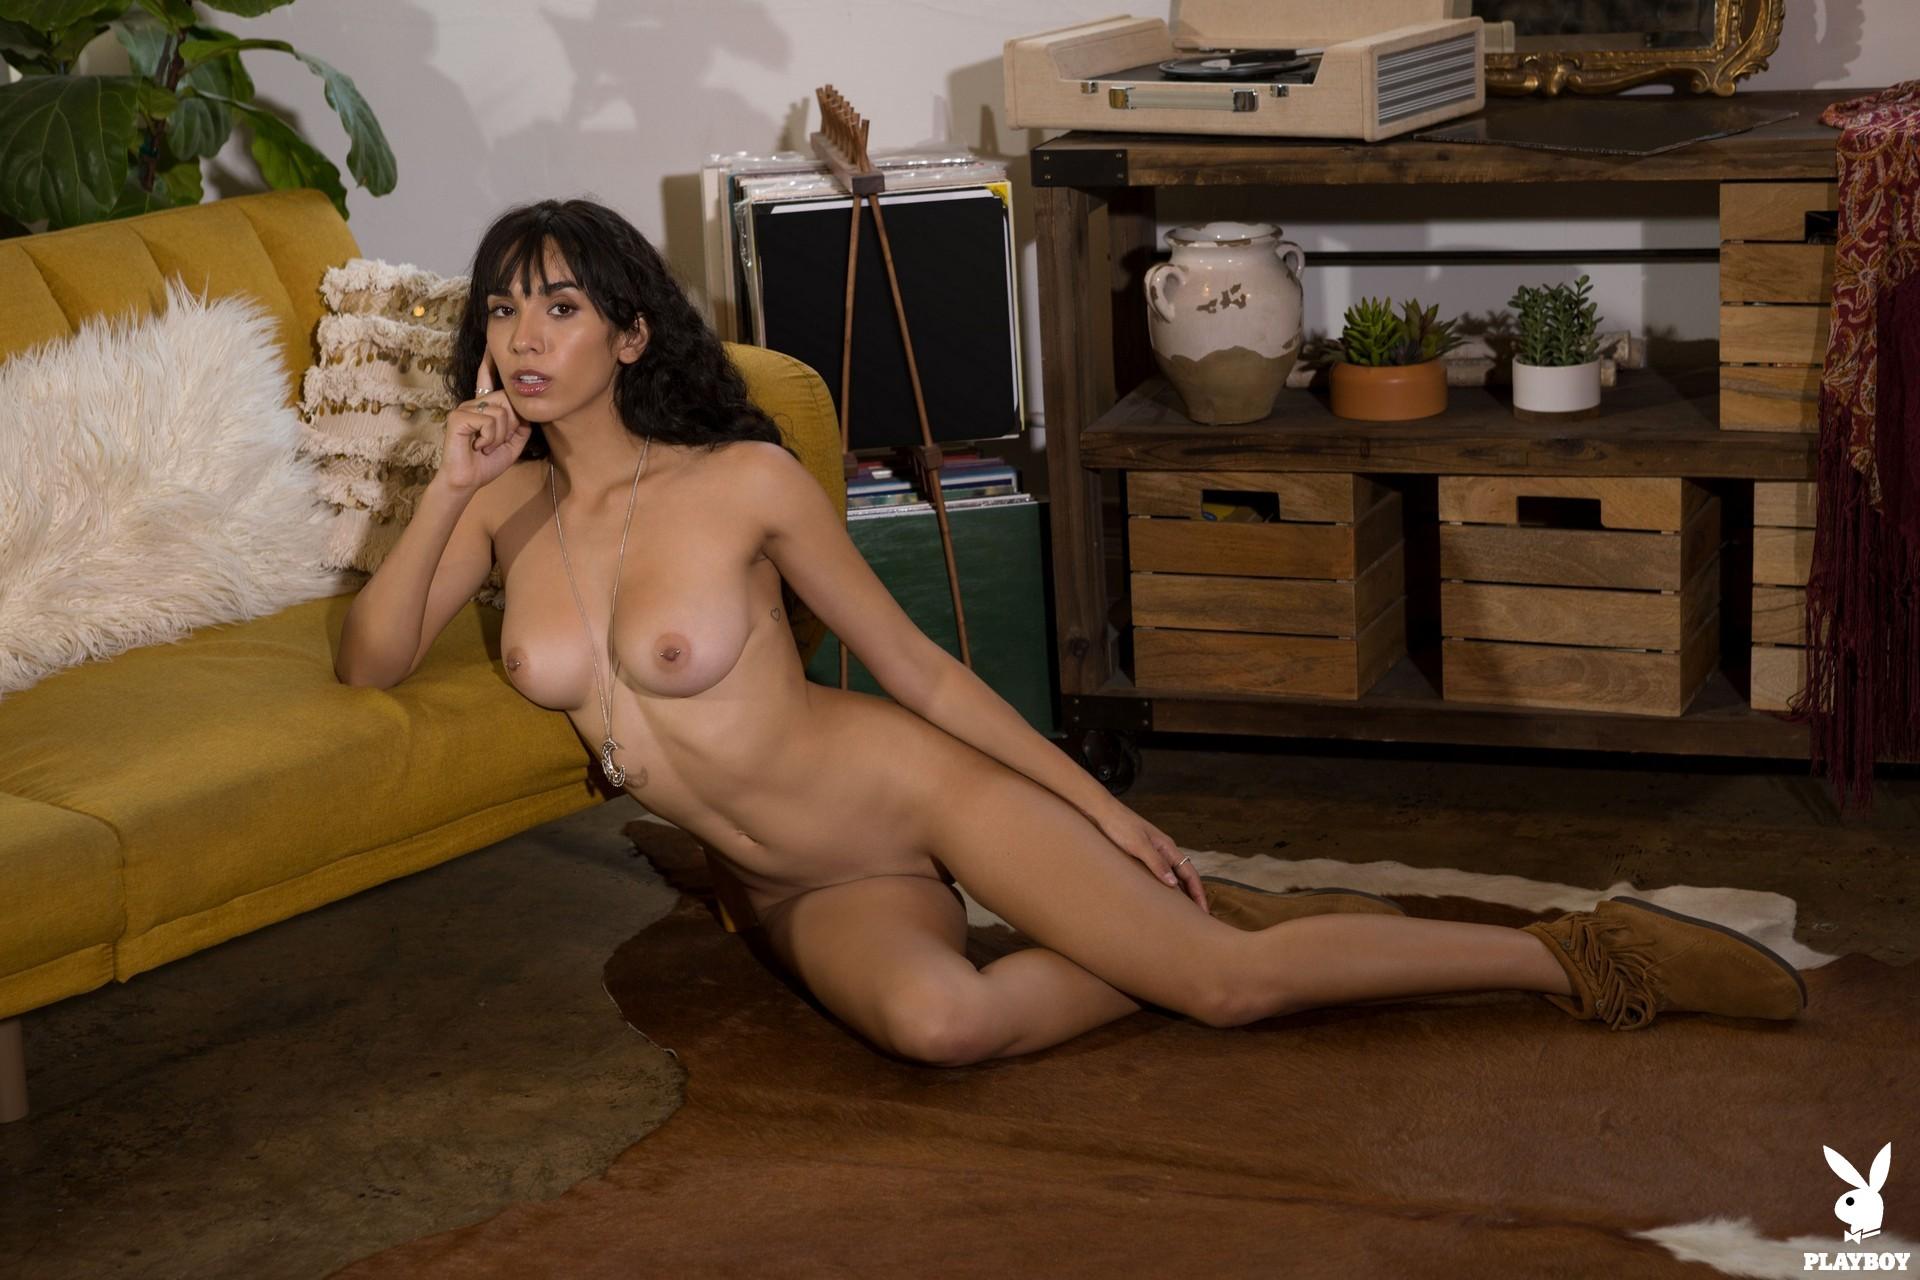 Erika De Leija in Funky and Free - Playboy Plus 17